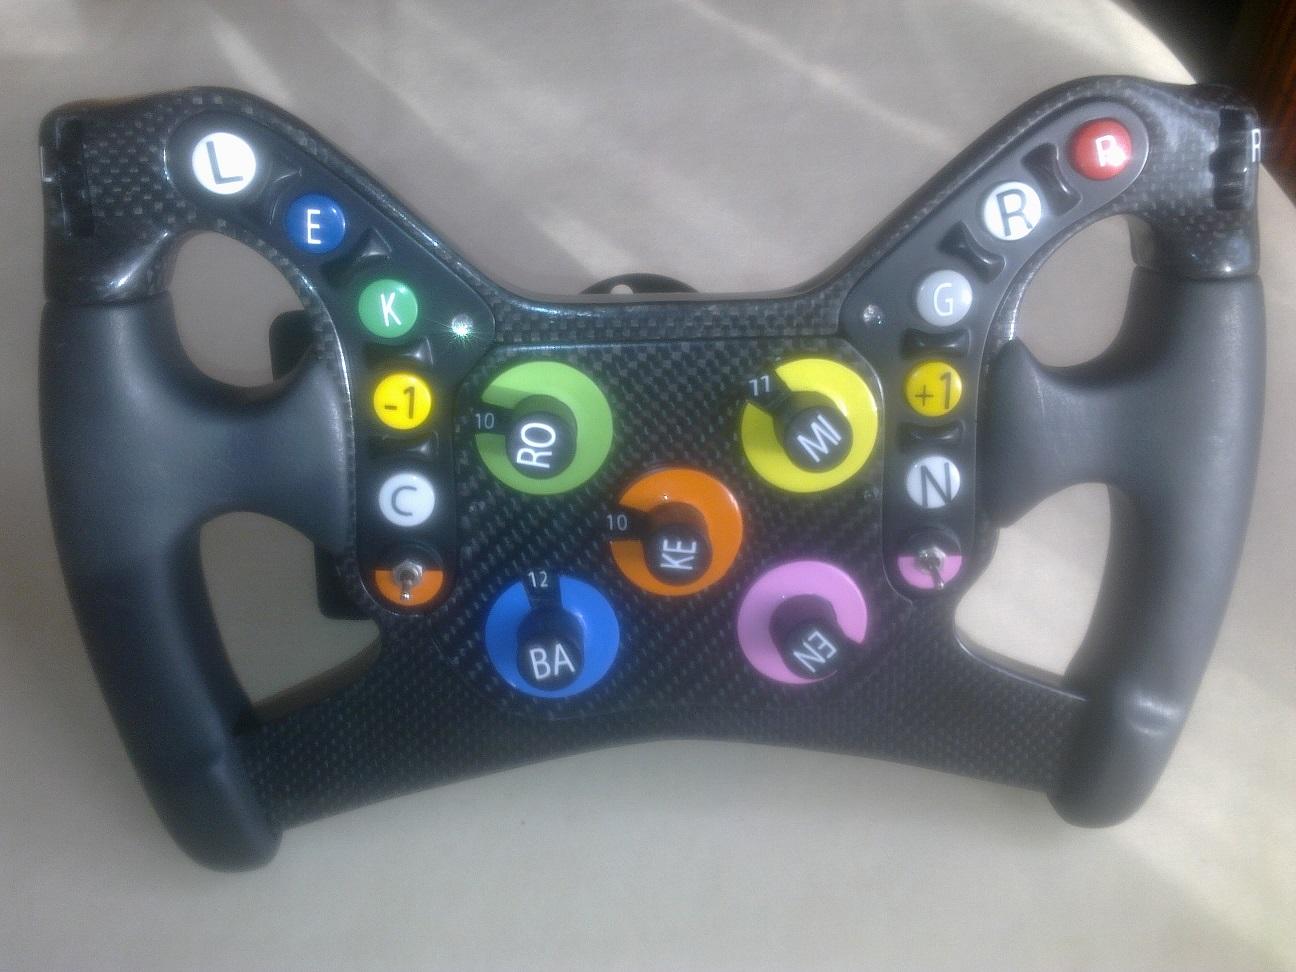 DIY F1 wheel RB mod | RaceDepartment - Latest Formula 1